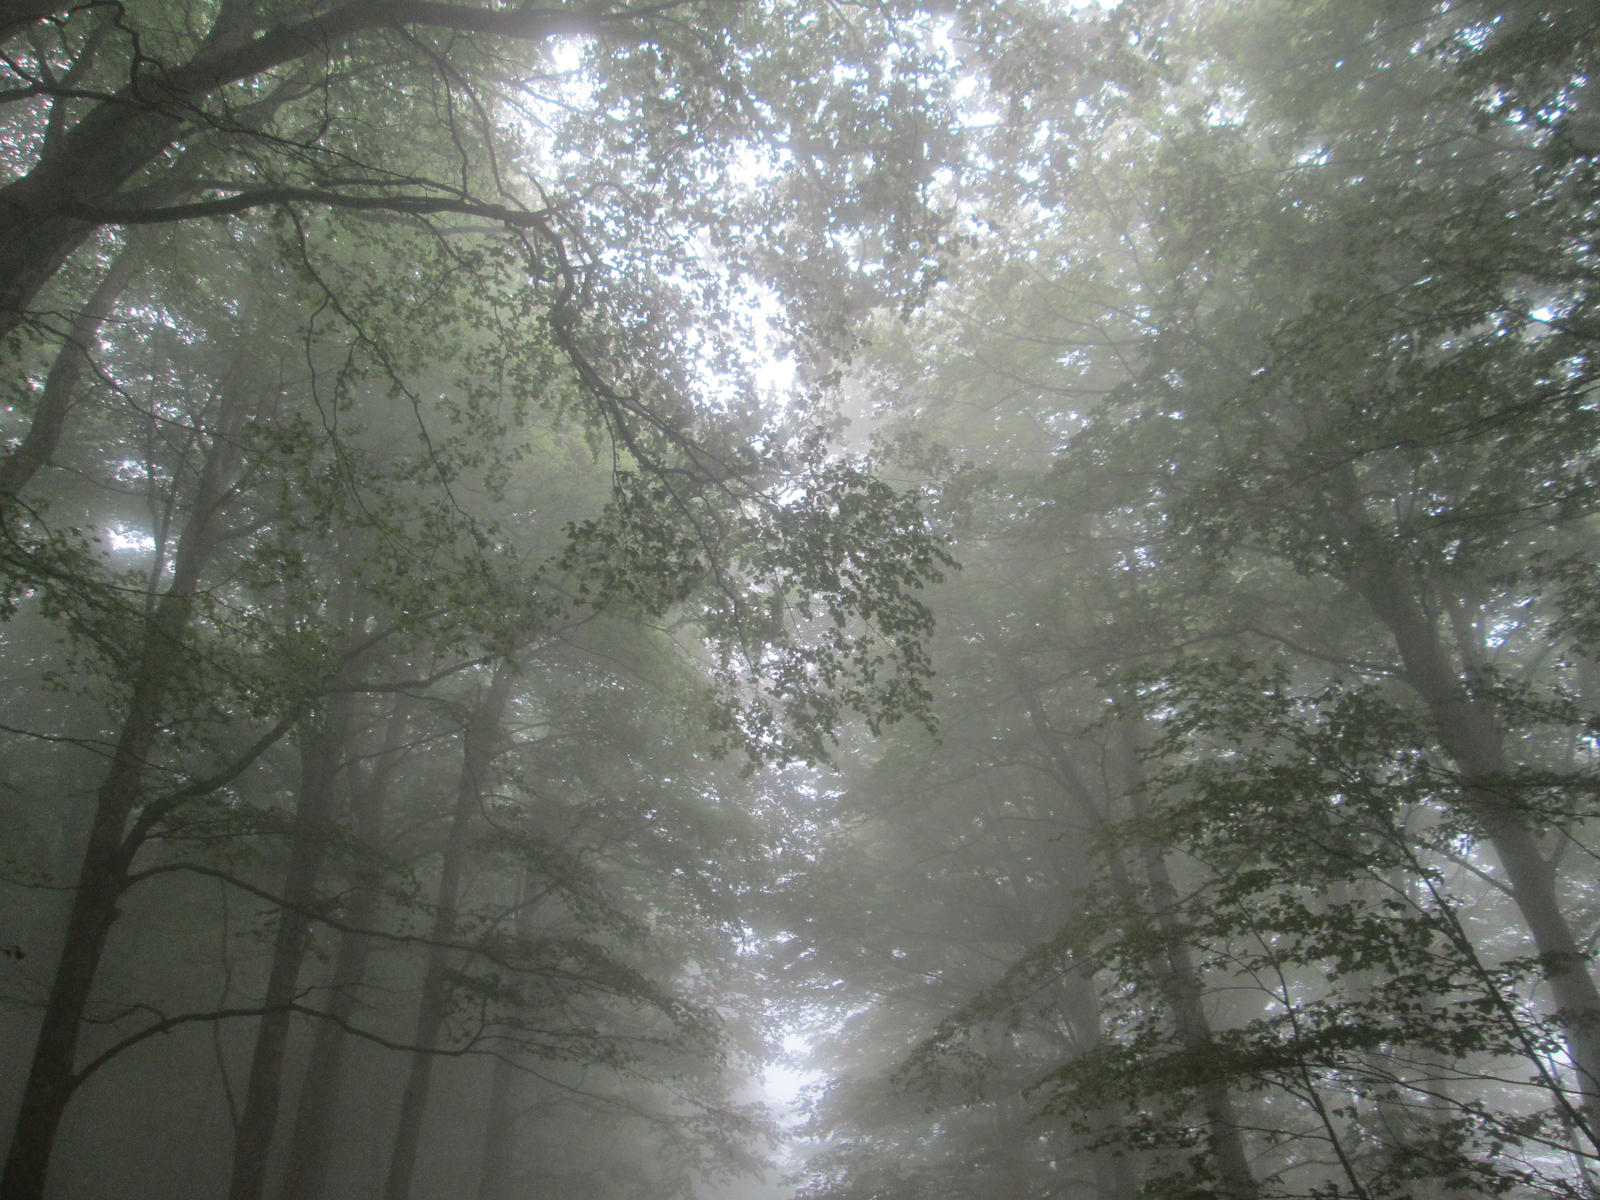 Misty woods 2 by FuriarossaAndMimma